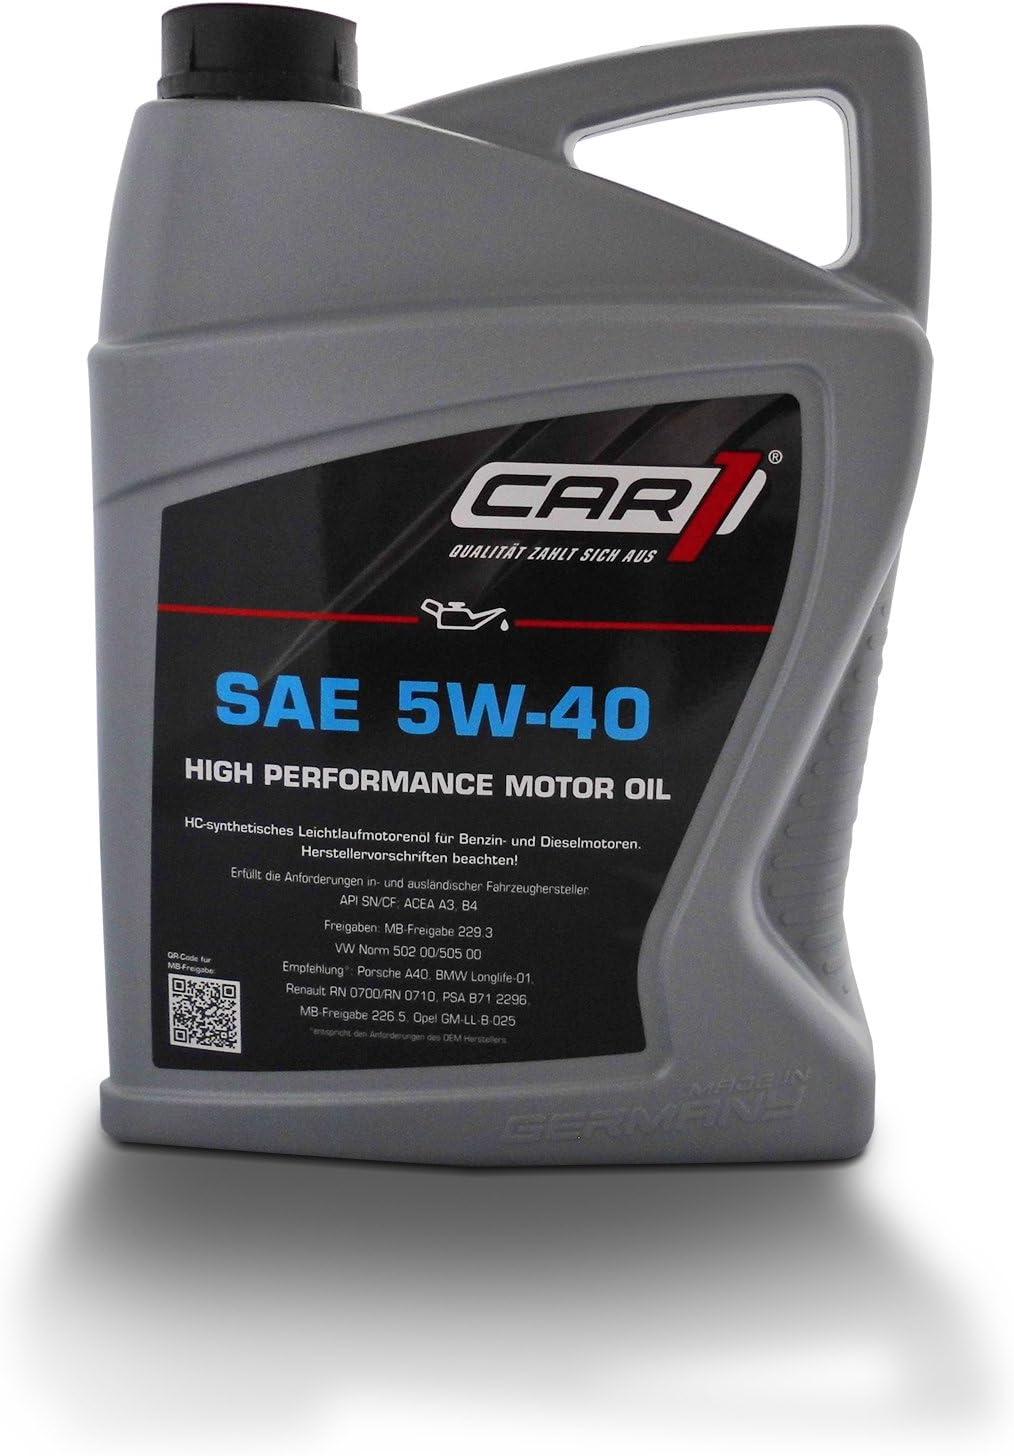 Car1 Engine Oil 5w 40 Smooth Running High Performance Engine Oil Petrol Diesel Petrol Engine Oil 5l Auto